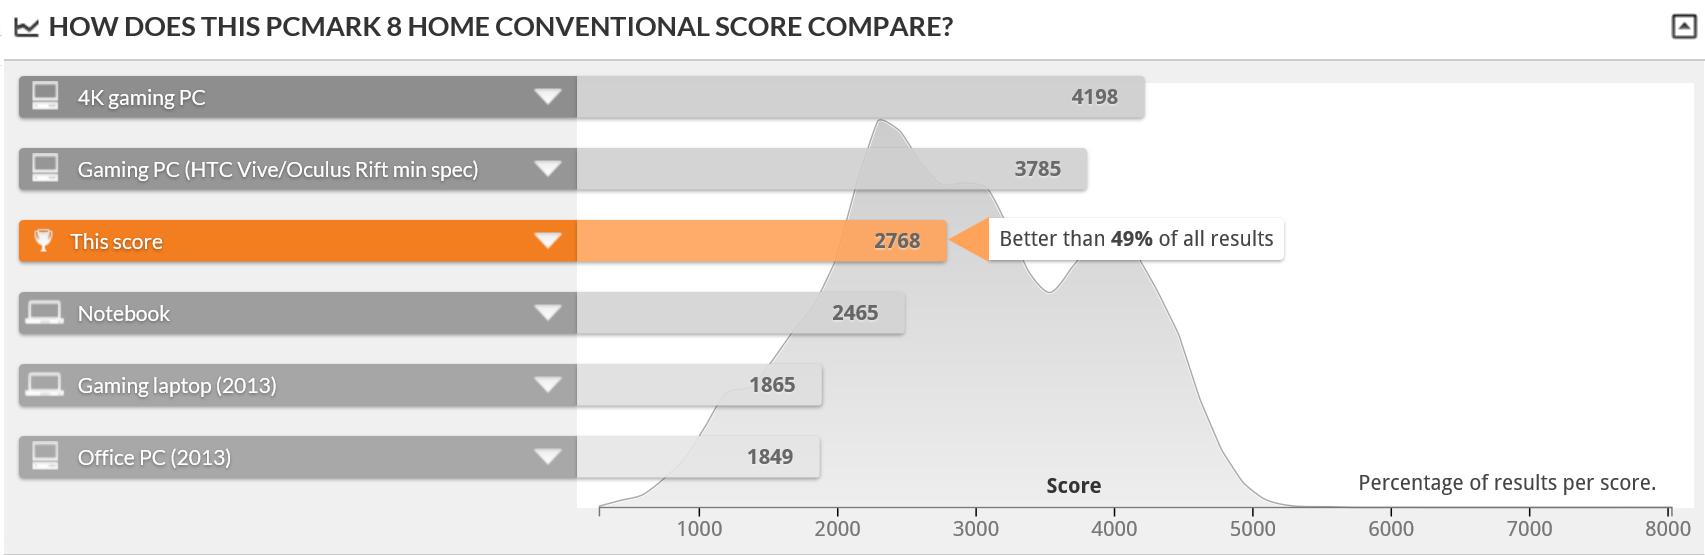 hp_probook_440_g4_pcmark8_home_conventional_graf